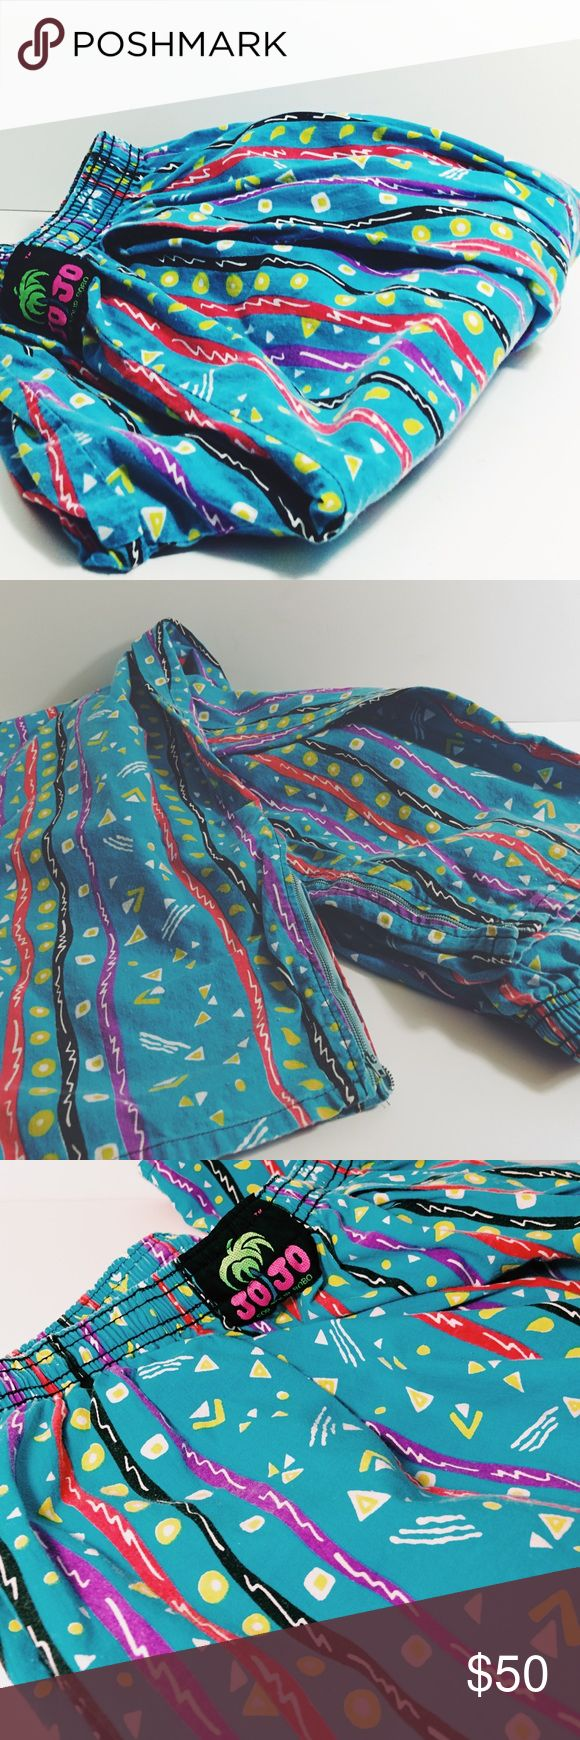 Vintage 90s JO JO Fresh Prince Pattern Harem Pants Amazing Bright 90s geometric harem, MC Hammer style pants. Size Large. Excellent condition. JO JO Pants